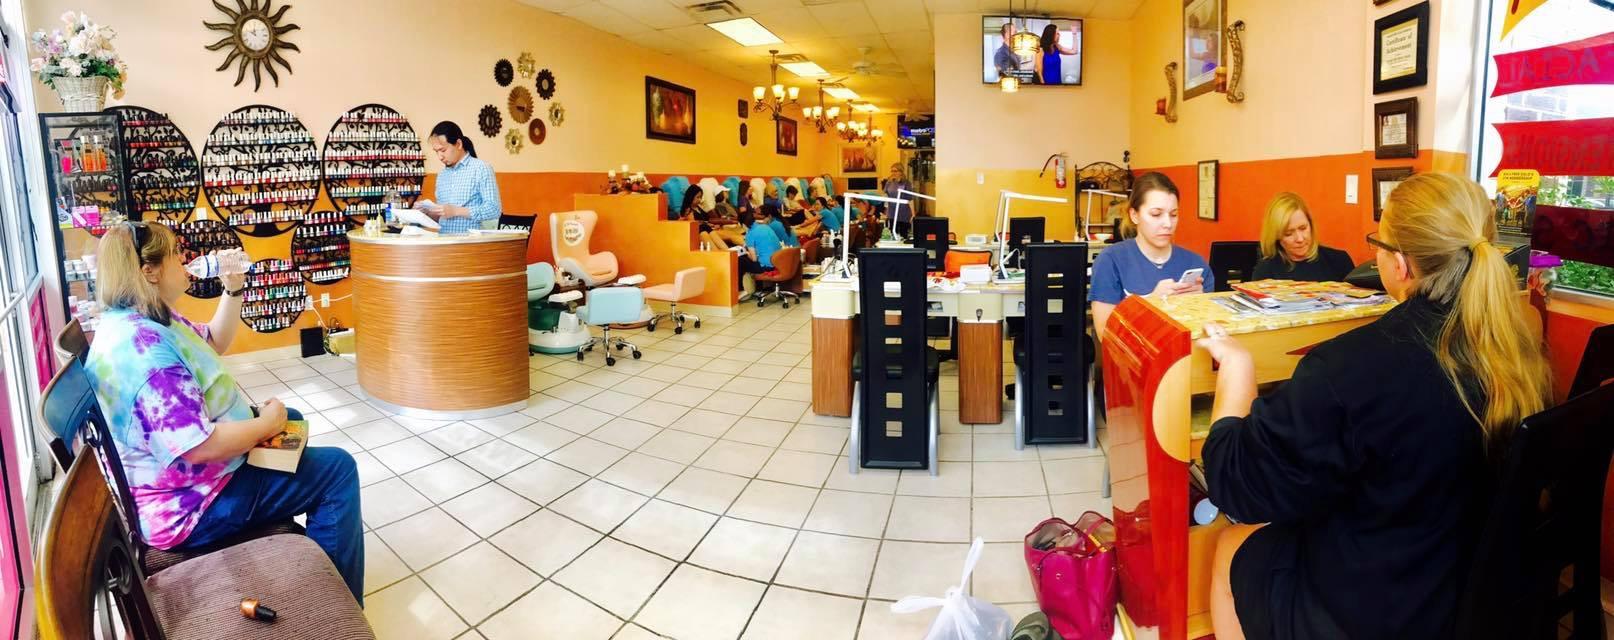 Diamond Nails & Spa in Round Rock Texas